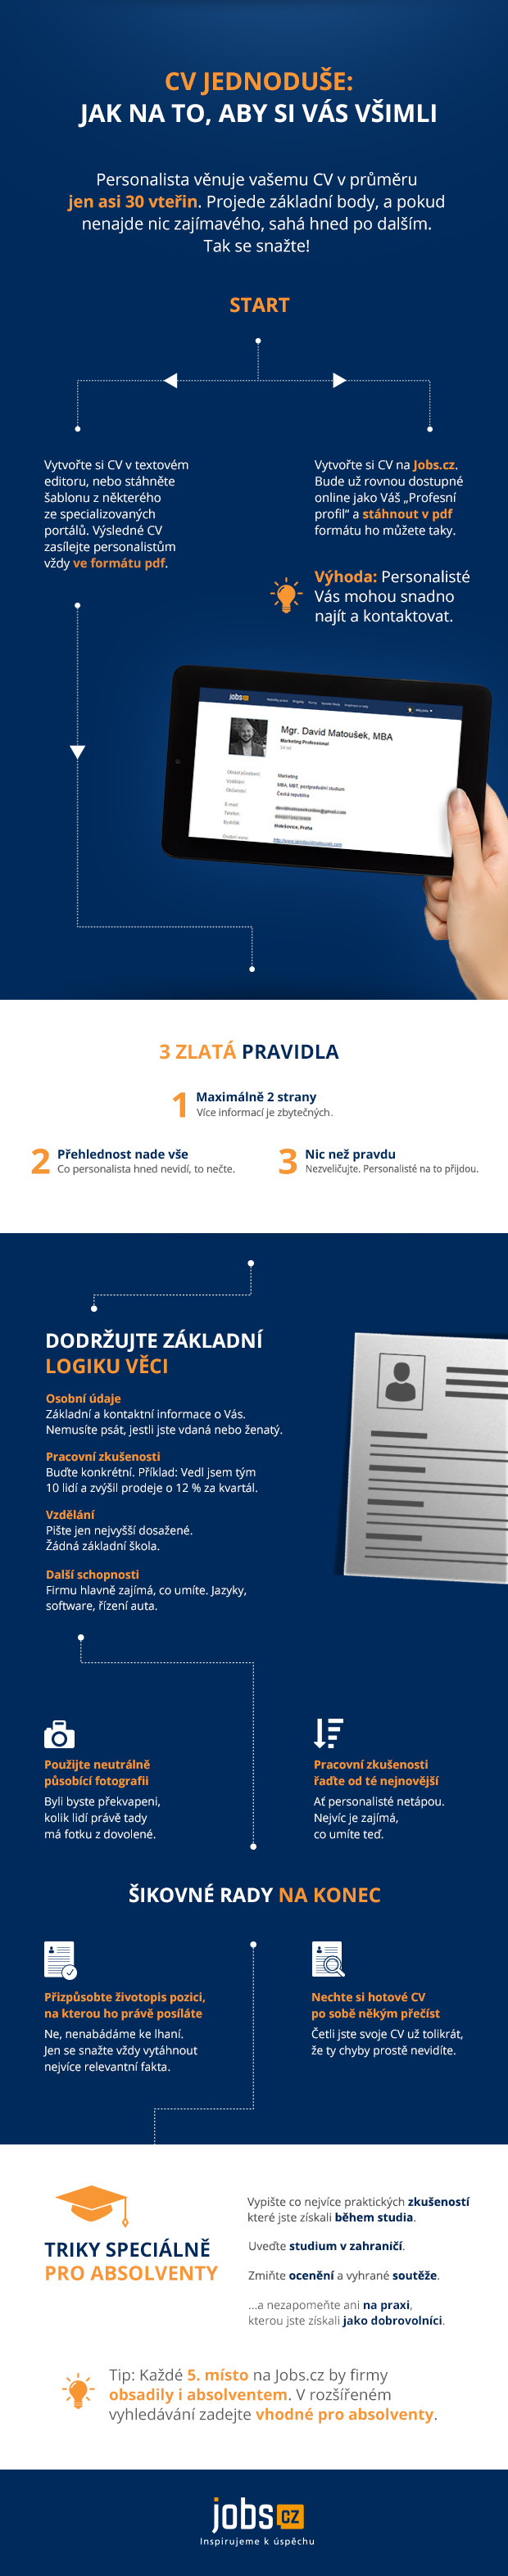 Infografika Jak Napsat Zivotopis Poradna Jobs Cz